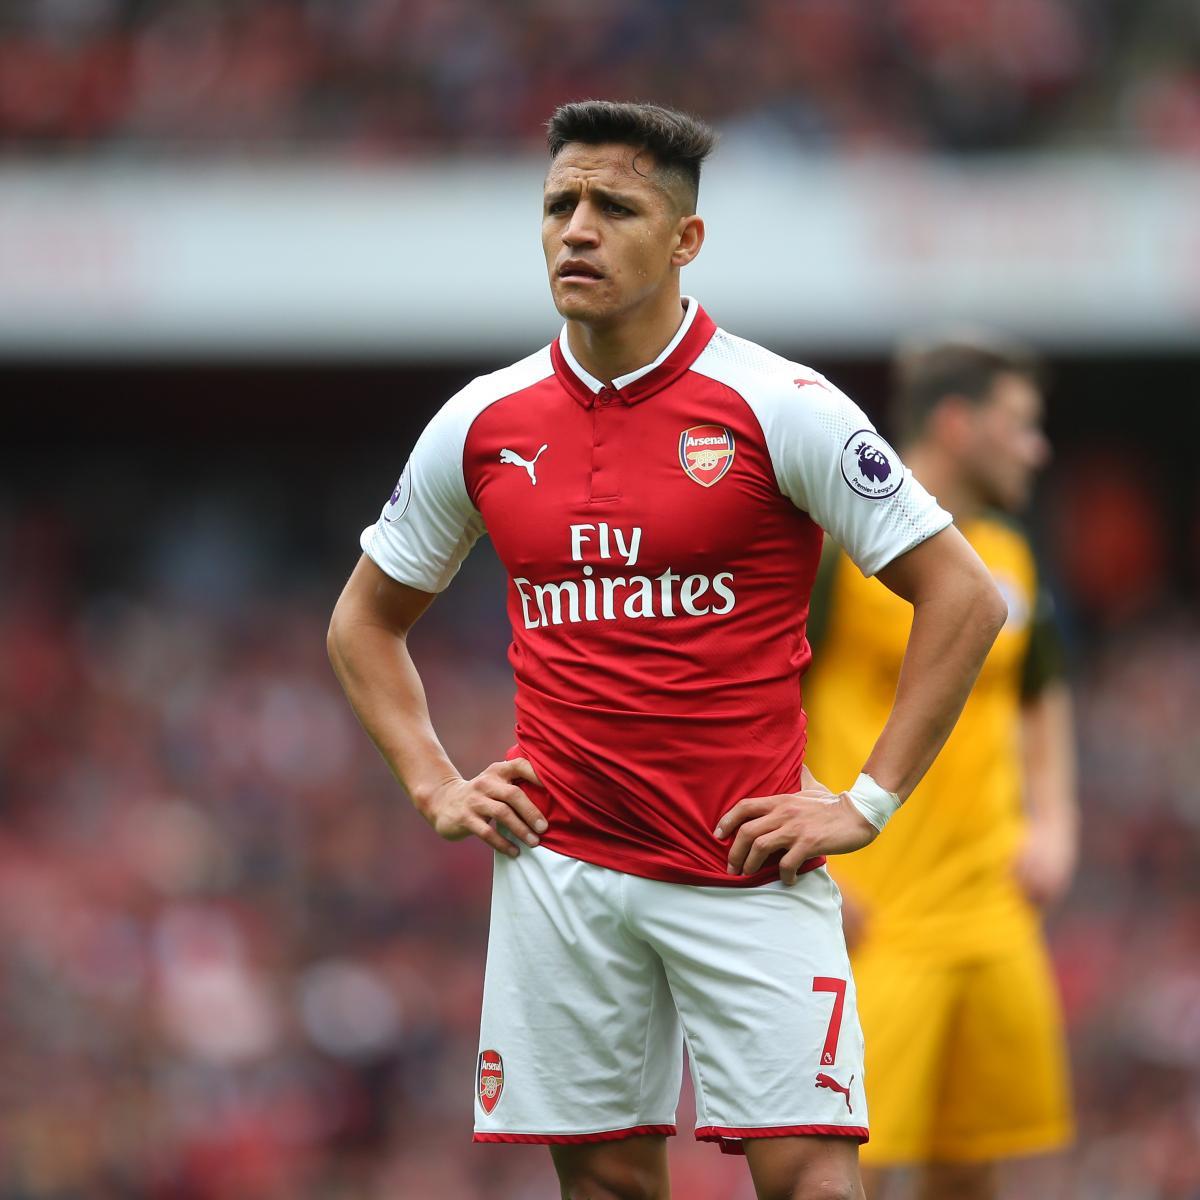 Arsene Wenger Admits January Exits 'Possible' for Alexis Sanchez, Mesut Ozil